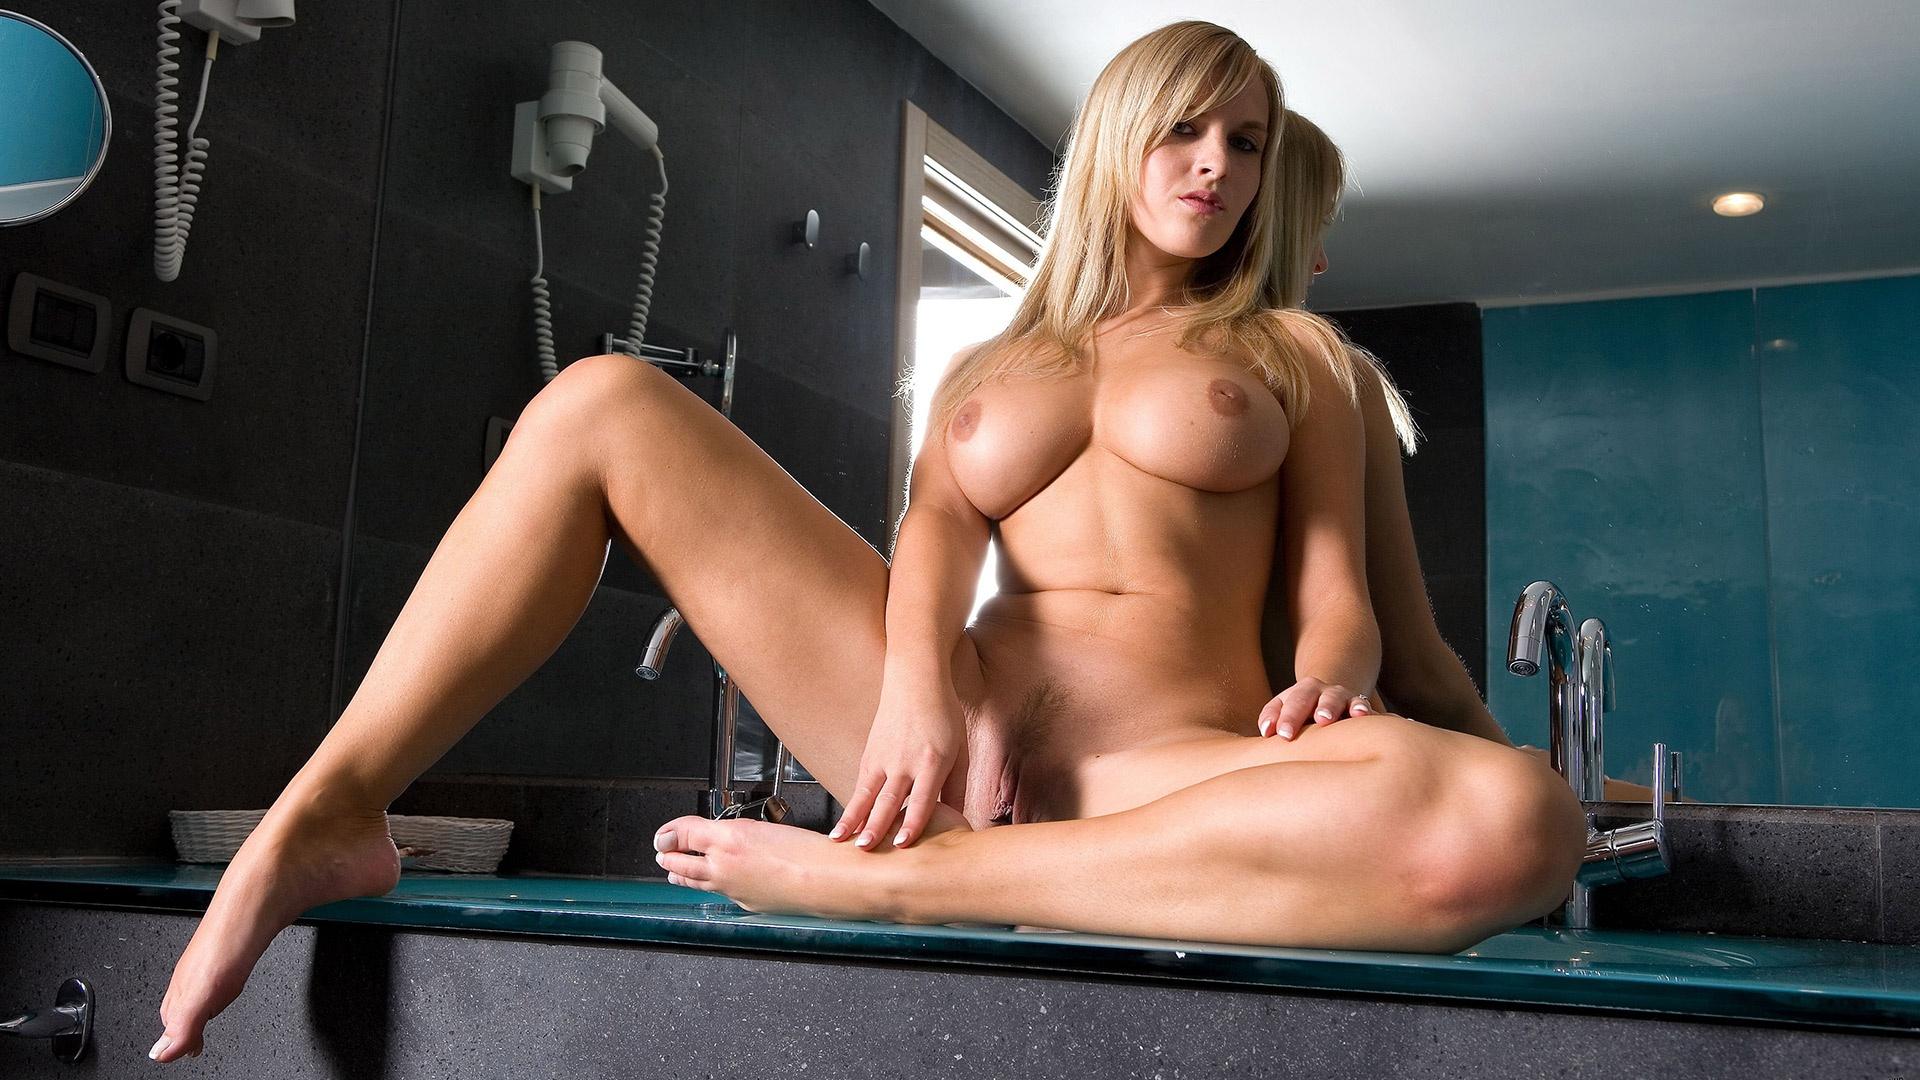 Free erotic photo thumbnail